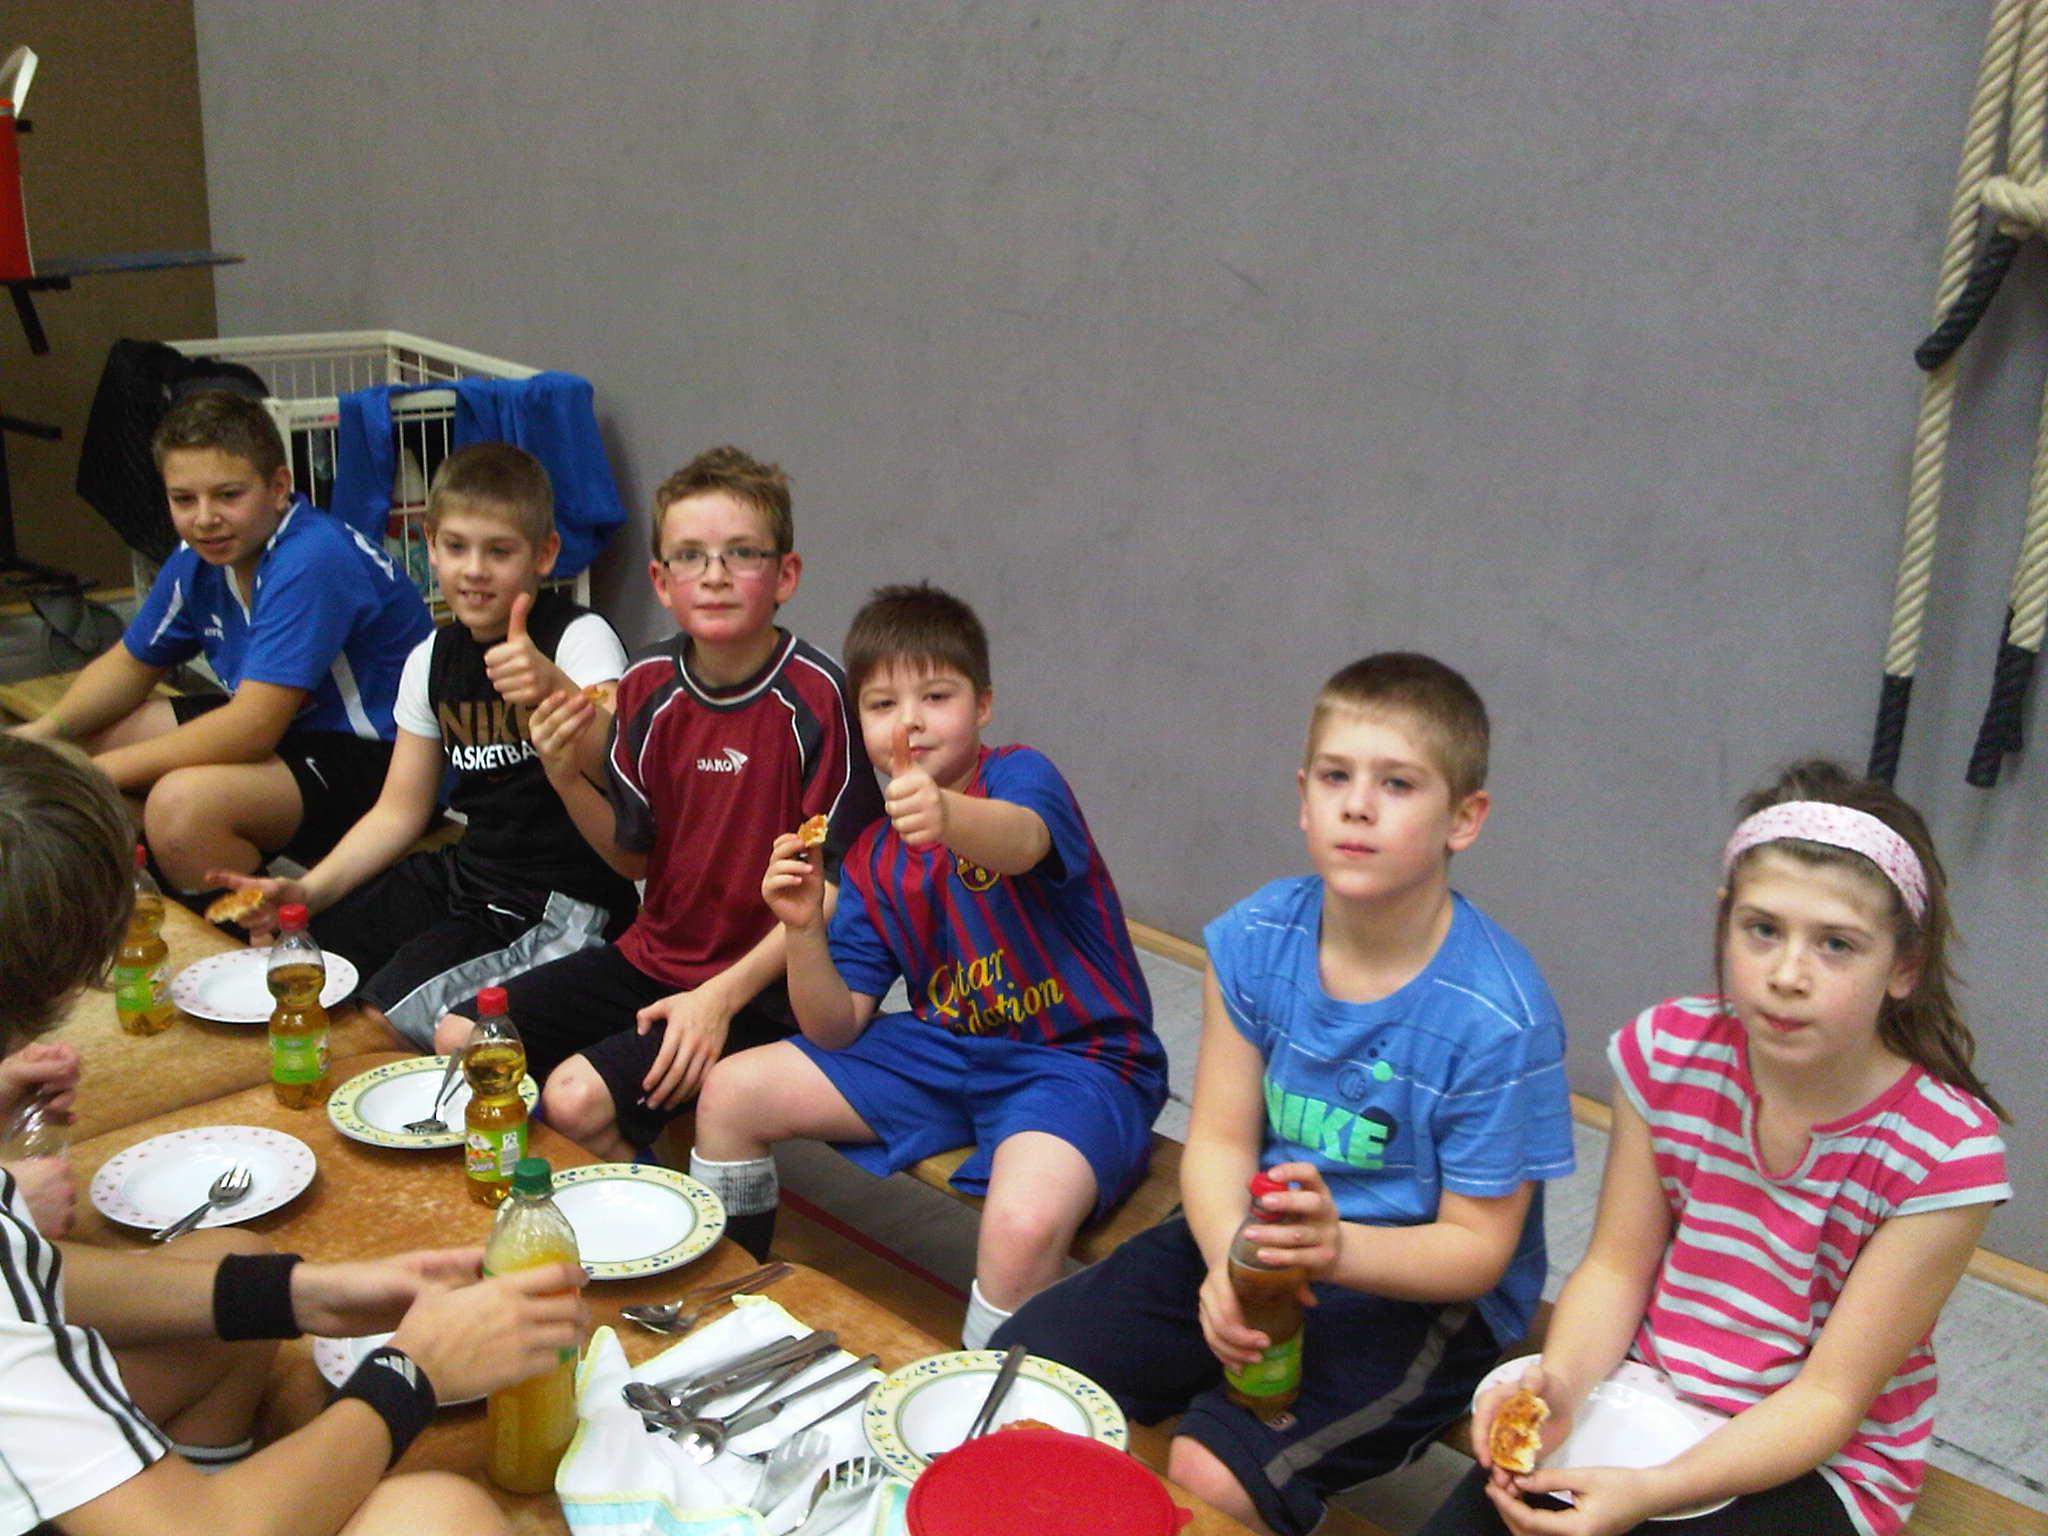 111210-4-SamstagsTraining-Mittagessen